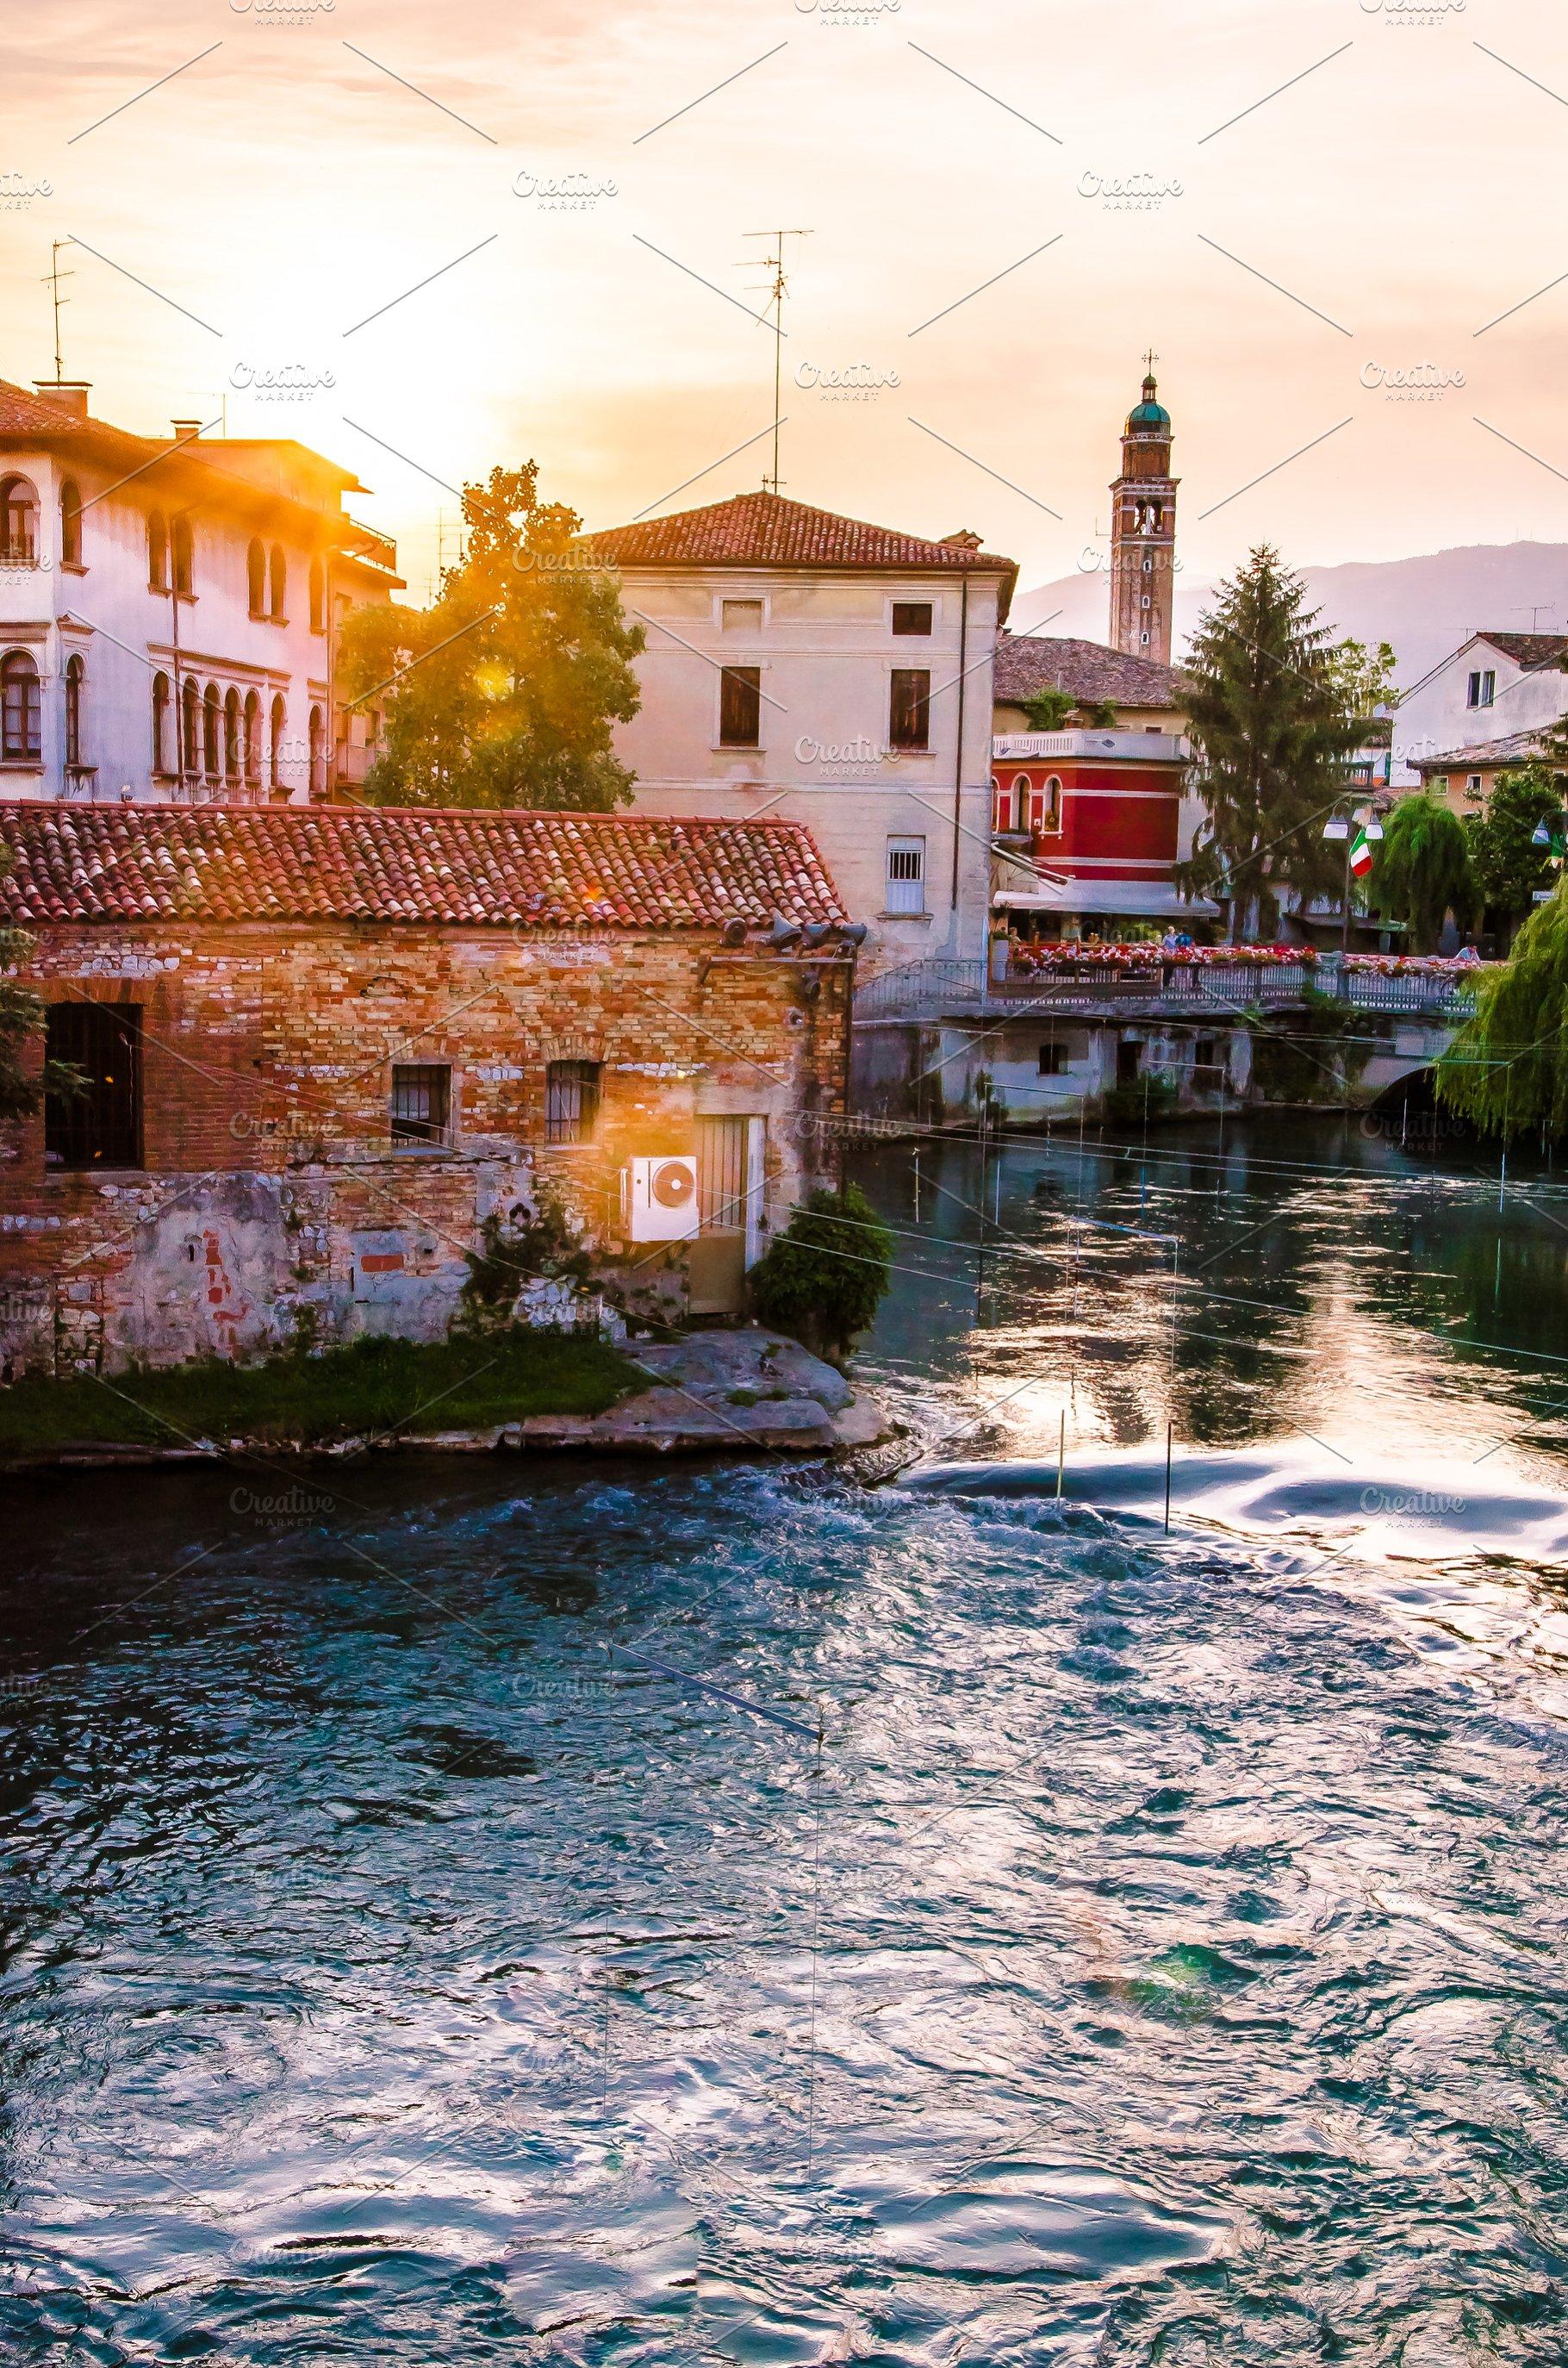 Picturesque Italian Landscape High Quality Architecture Stock